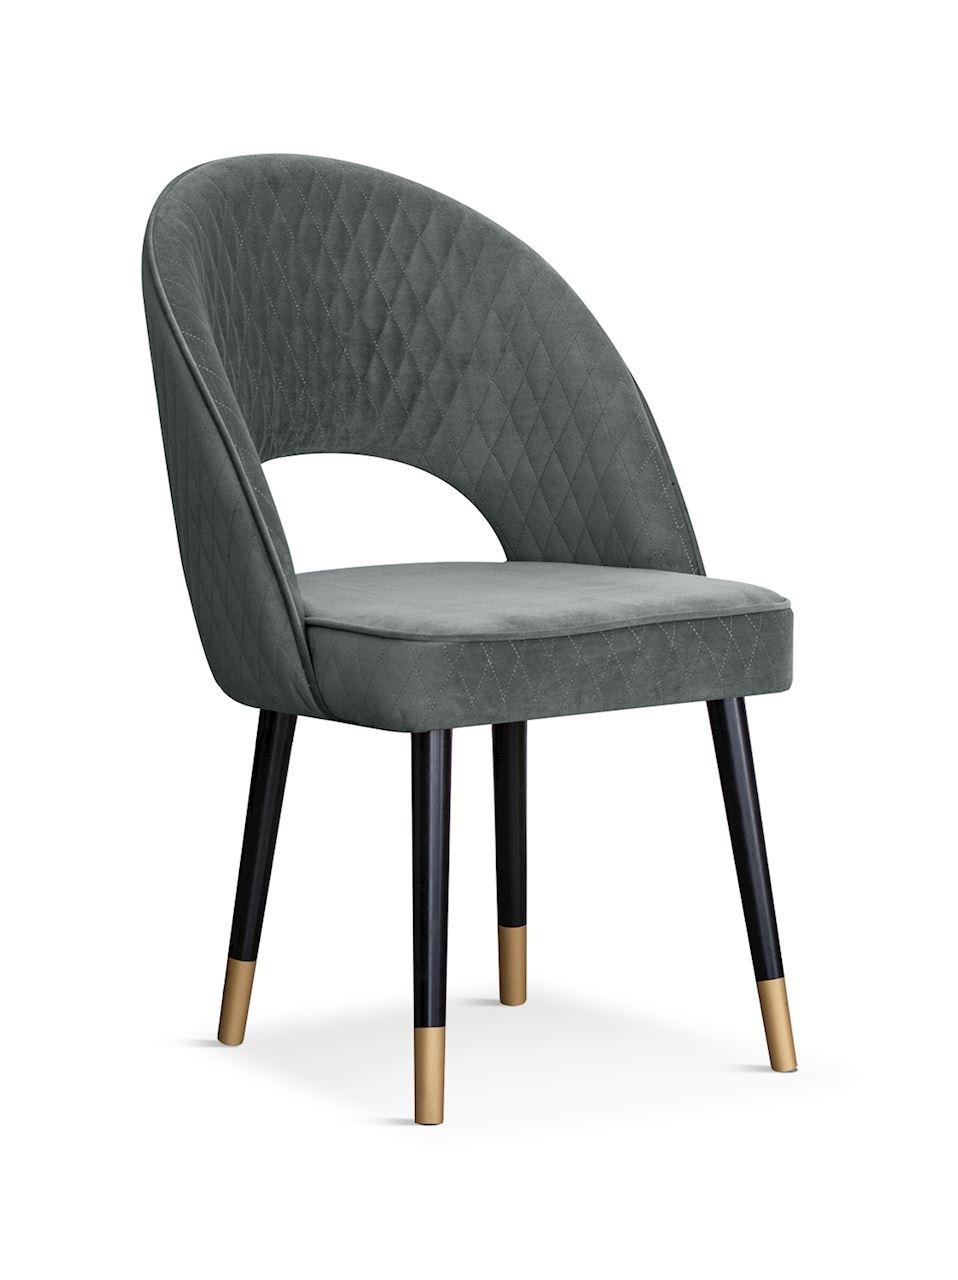 Scaun tapitat cu stofa si picioare metalice Ponte Velvet Gri / Negru / Auriu, l56xA63xH89 cm somproduct.ro